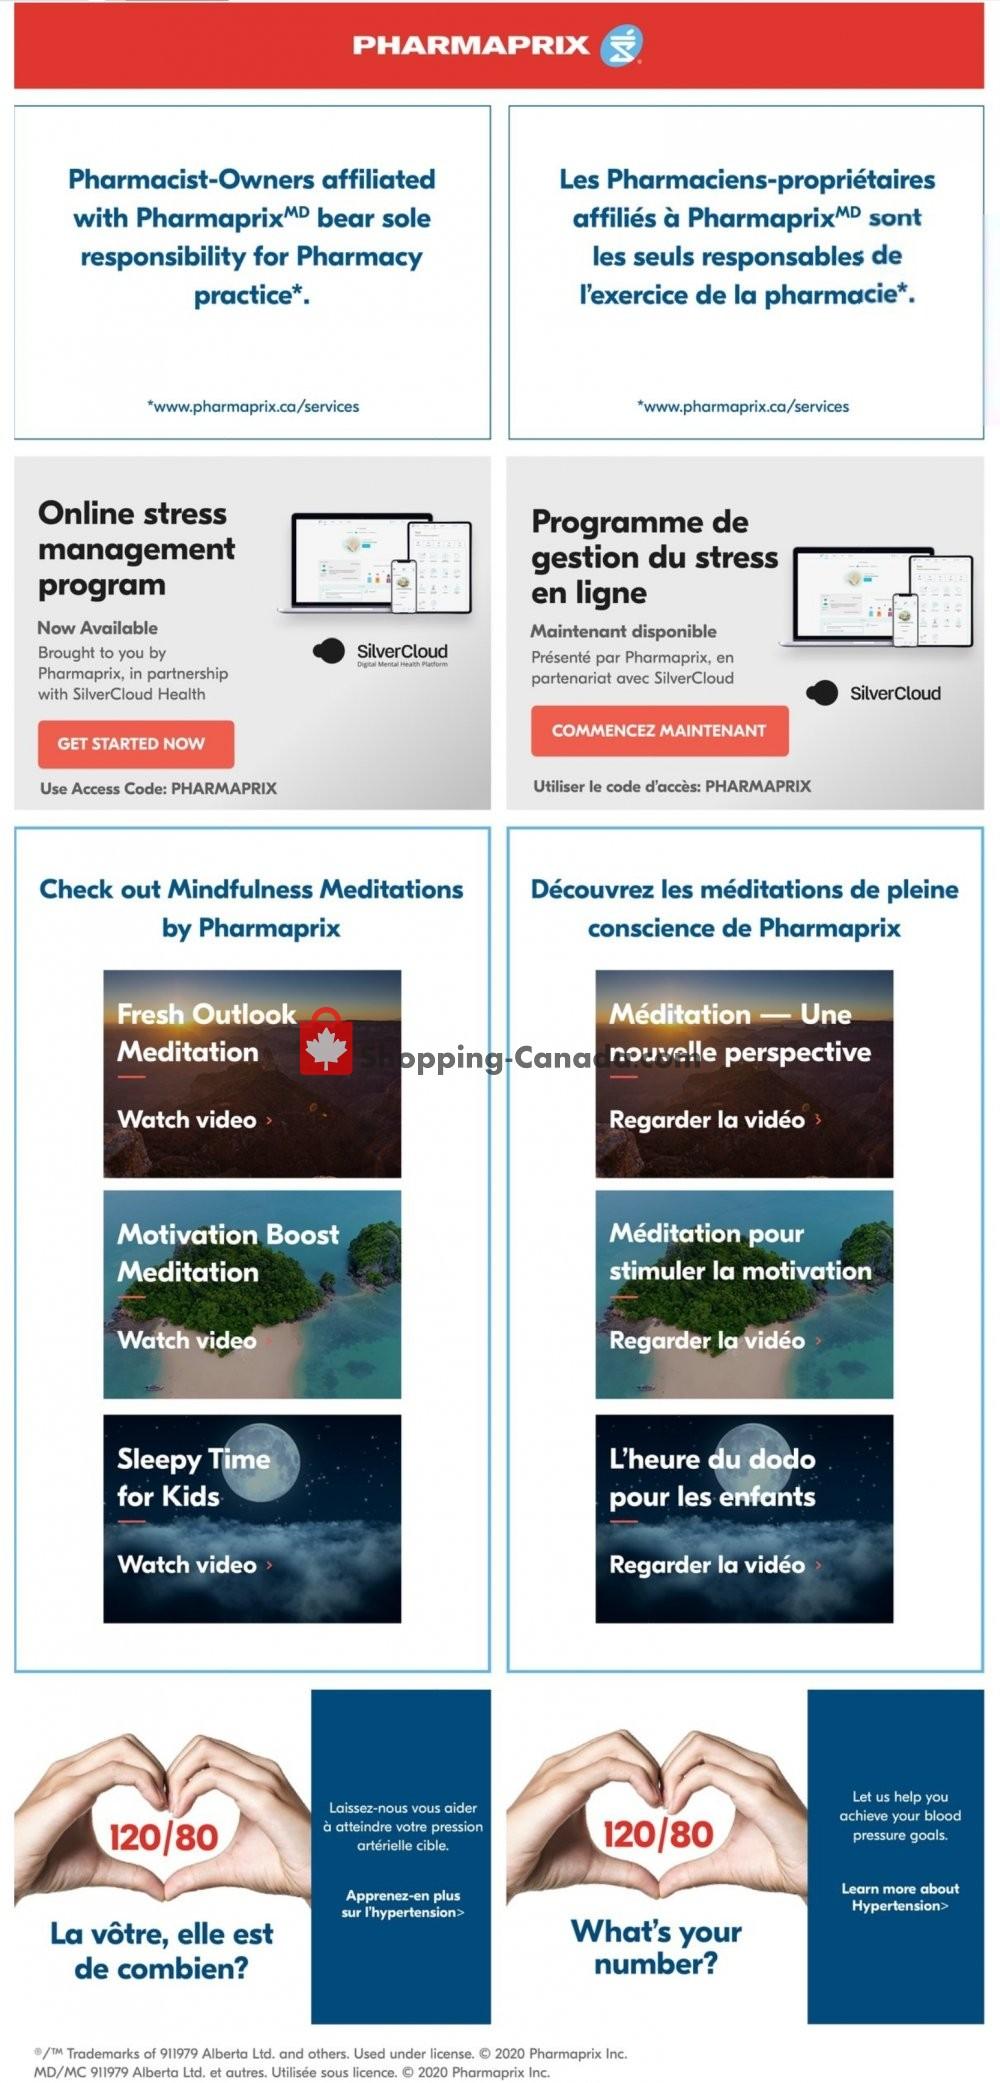 Flyer Pharmaprix Canada - from Saturday July 11, 2020 to Thursday July 16, 2020